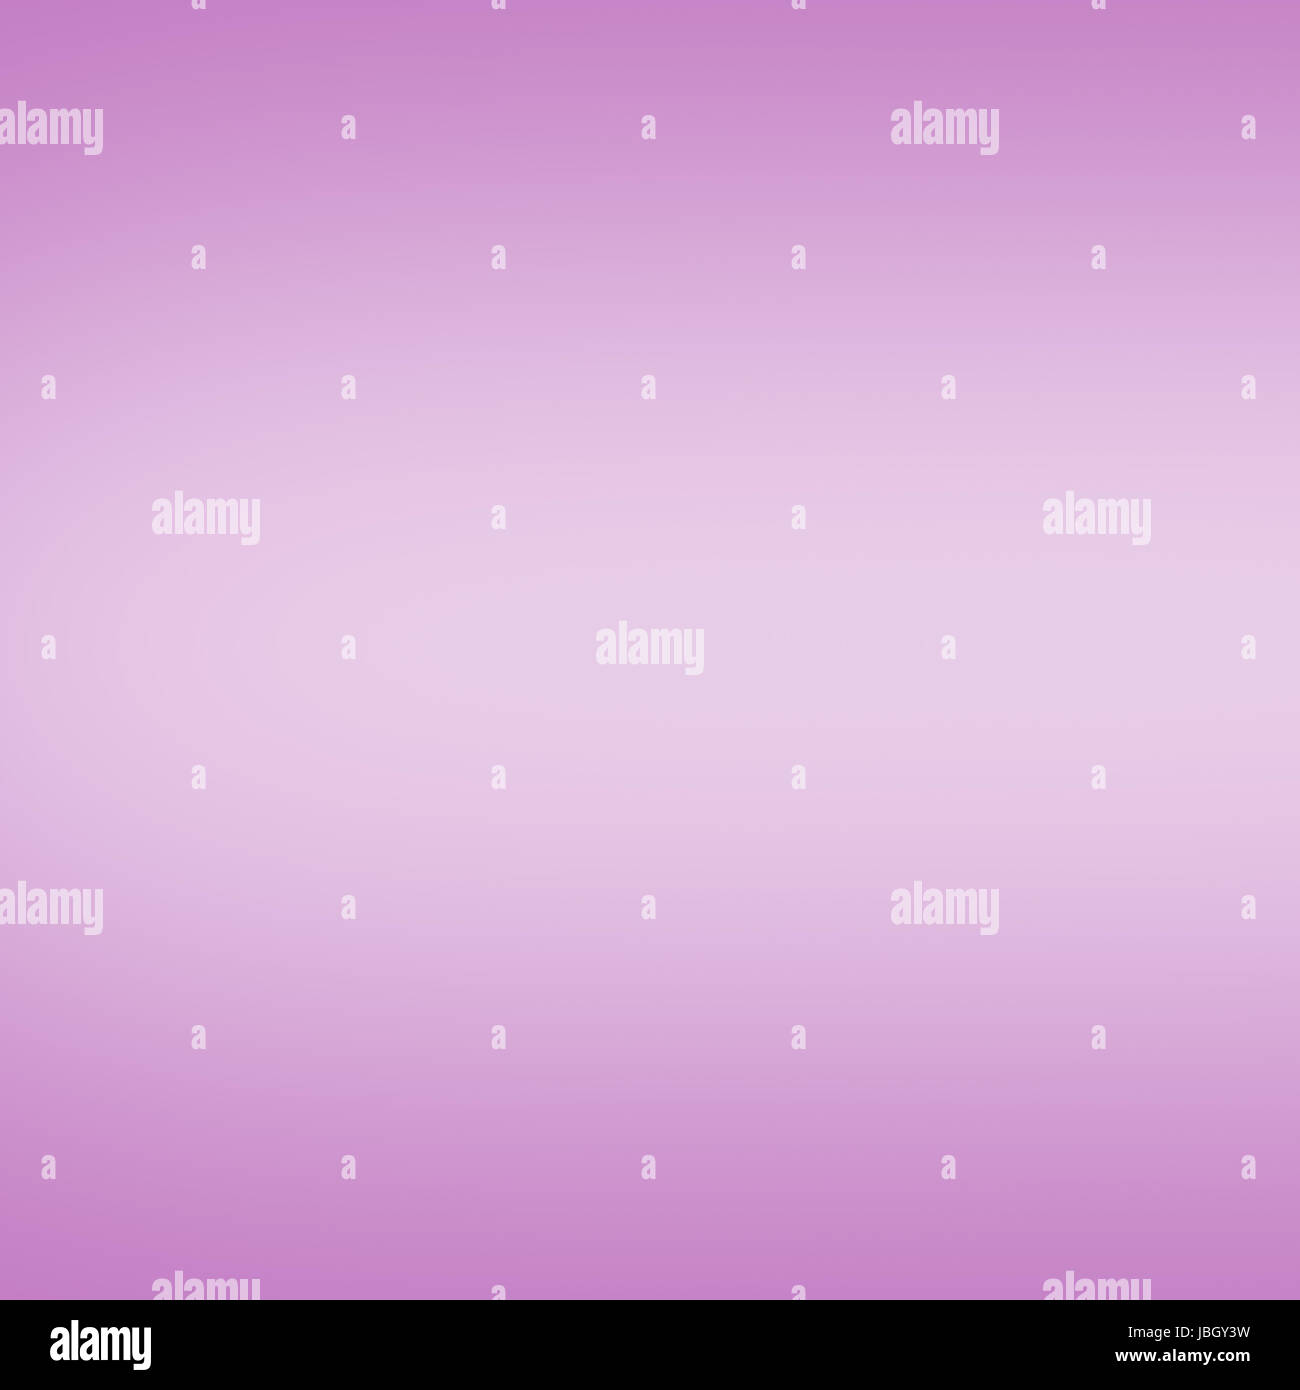 Abstract Sfondo Rosa Sfumatura Rosa Viola Foto Immagine Stock